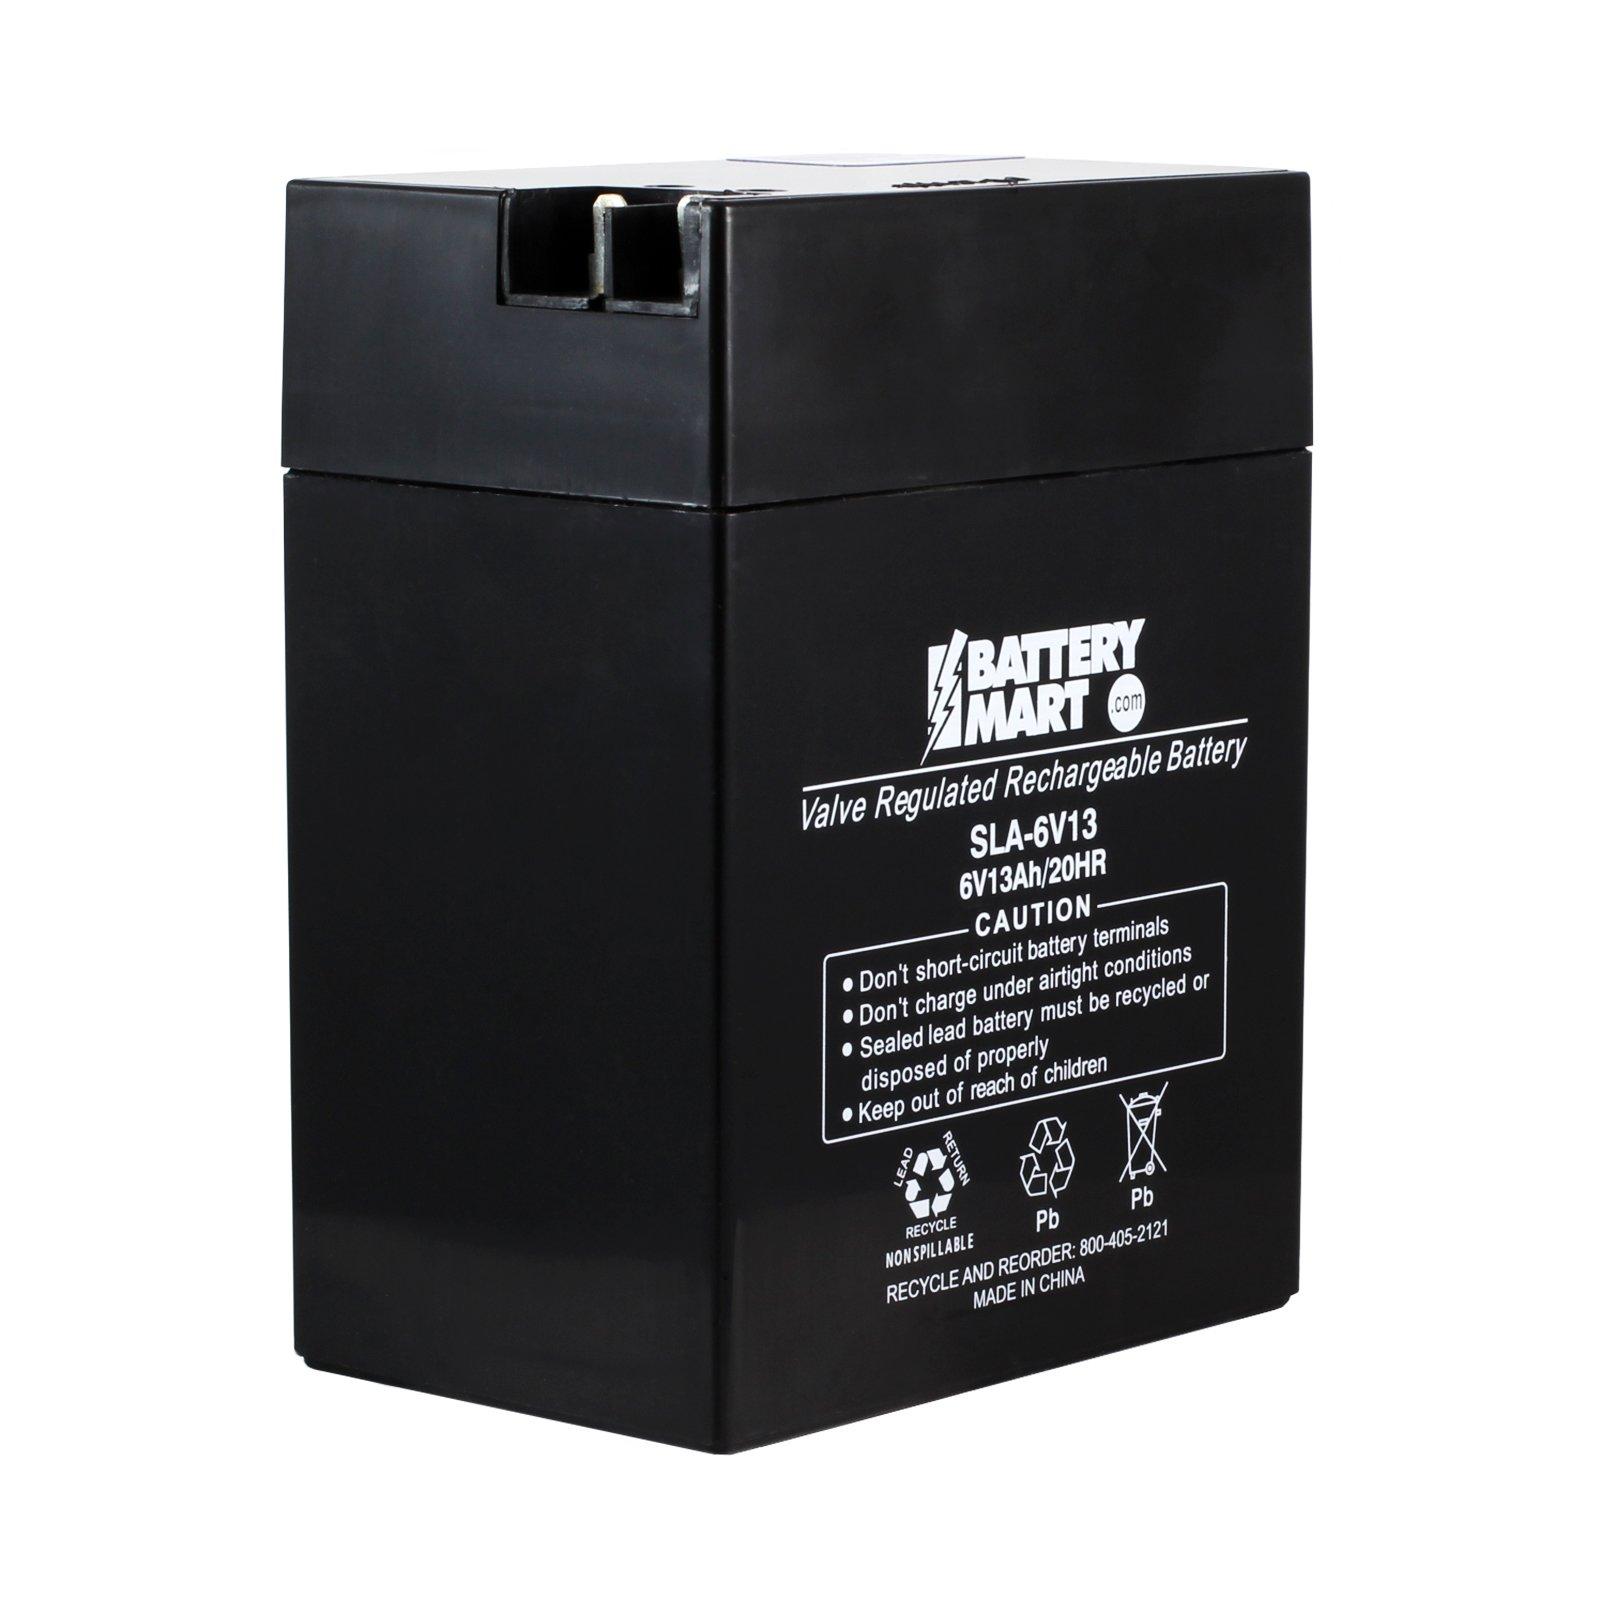 6 Volt 13 Ah Sealed Lead Acid Rechargeable Battery